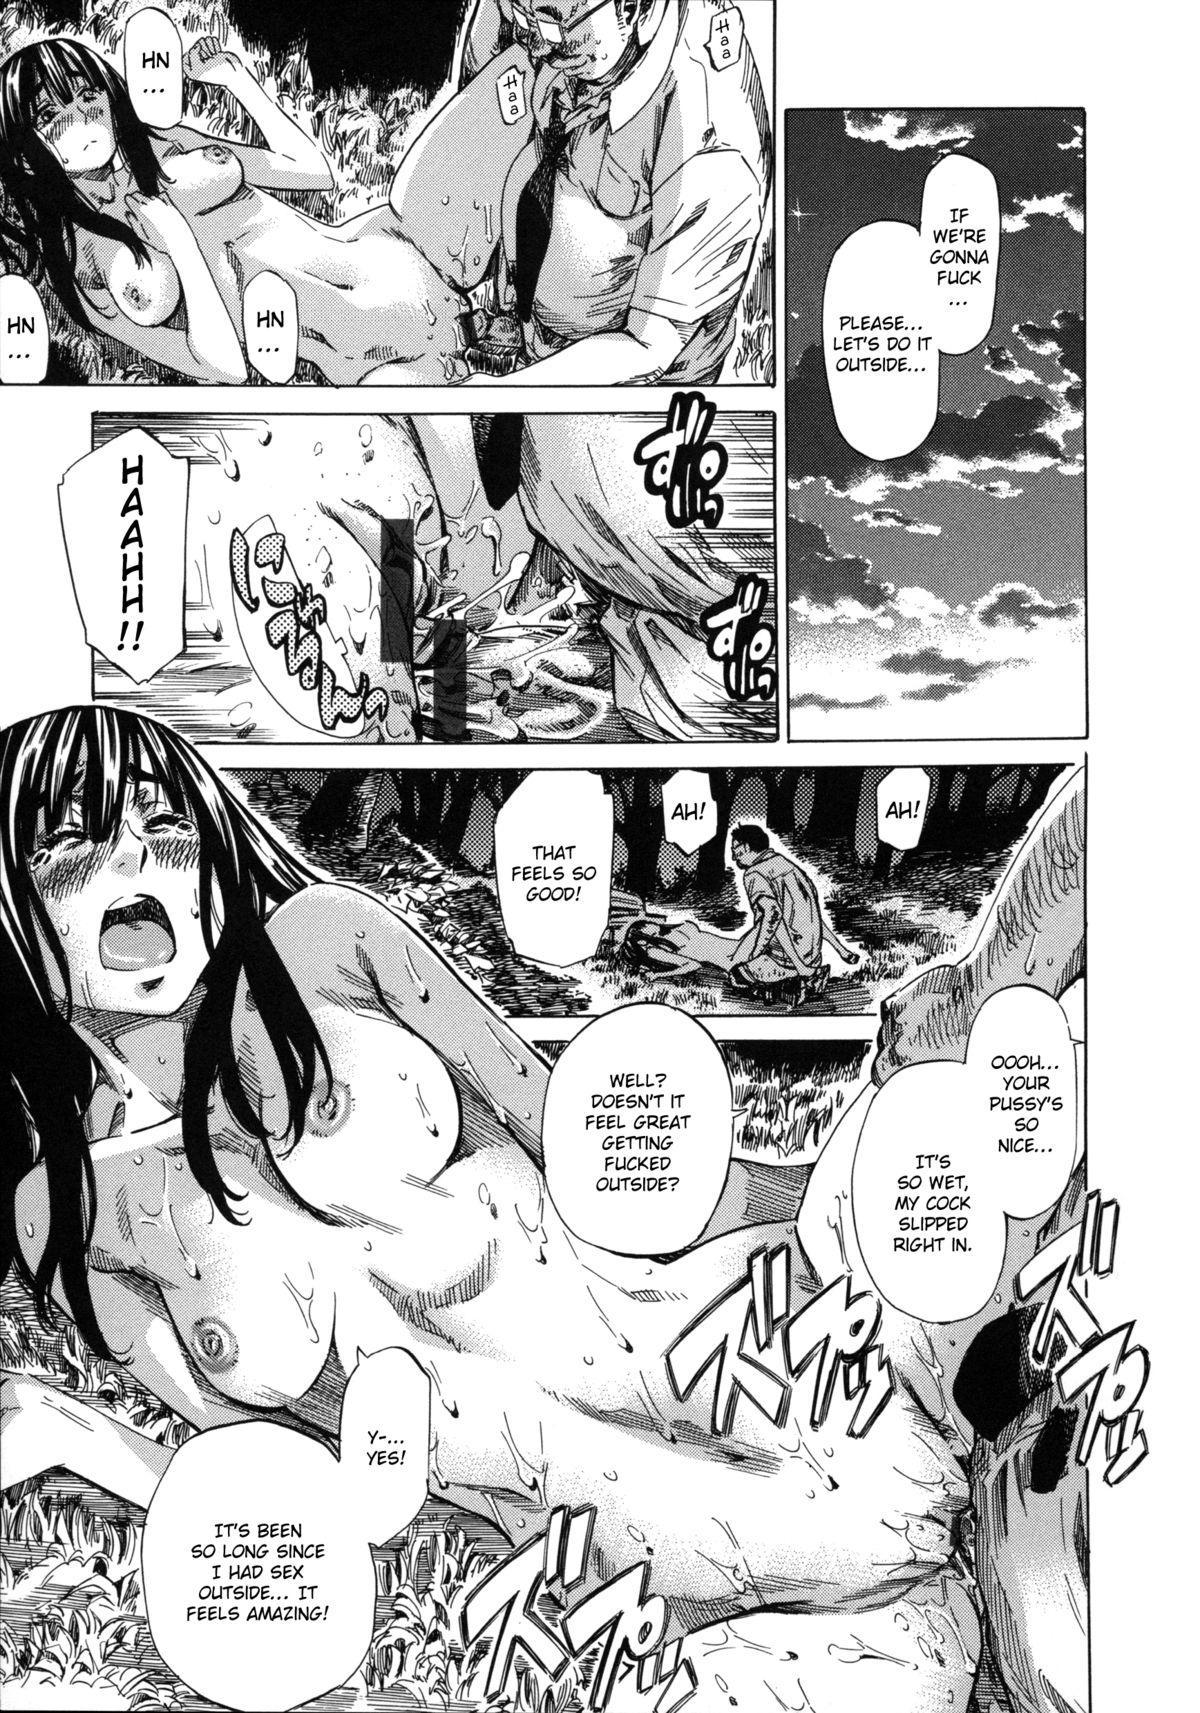 Kashiwazaki Miki wa Ironna Basho de Zenra Sanpo Shitemita | Miki Kashiwazaki Goes Naked in All Sorts of Places 145